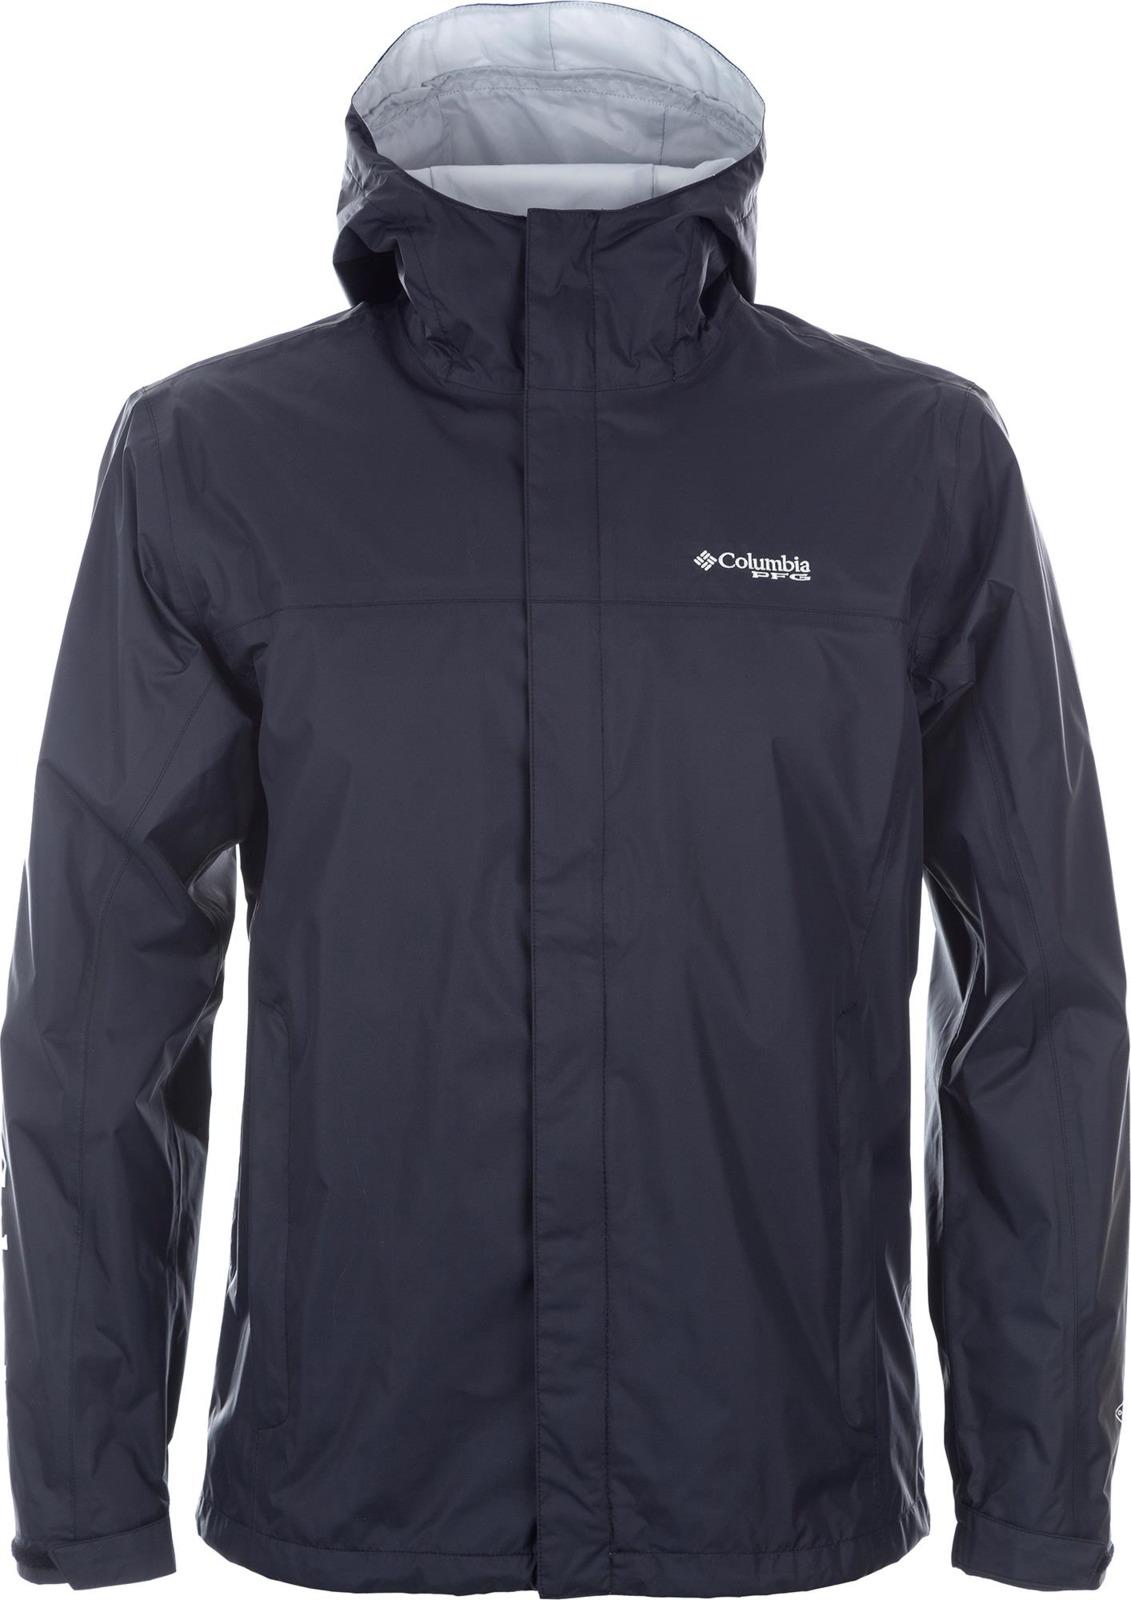 Ветровка Columbia PFG Storm Jacket